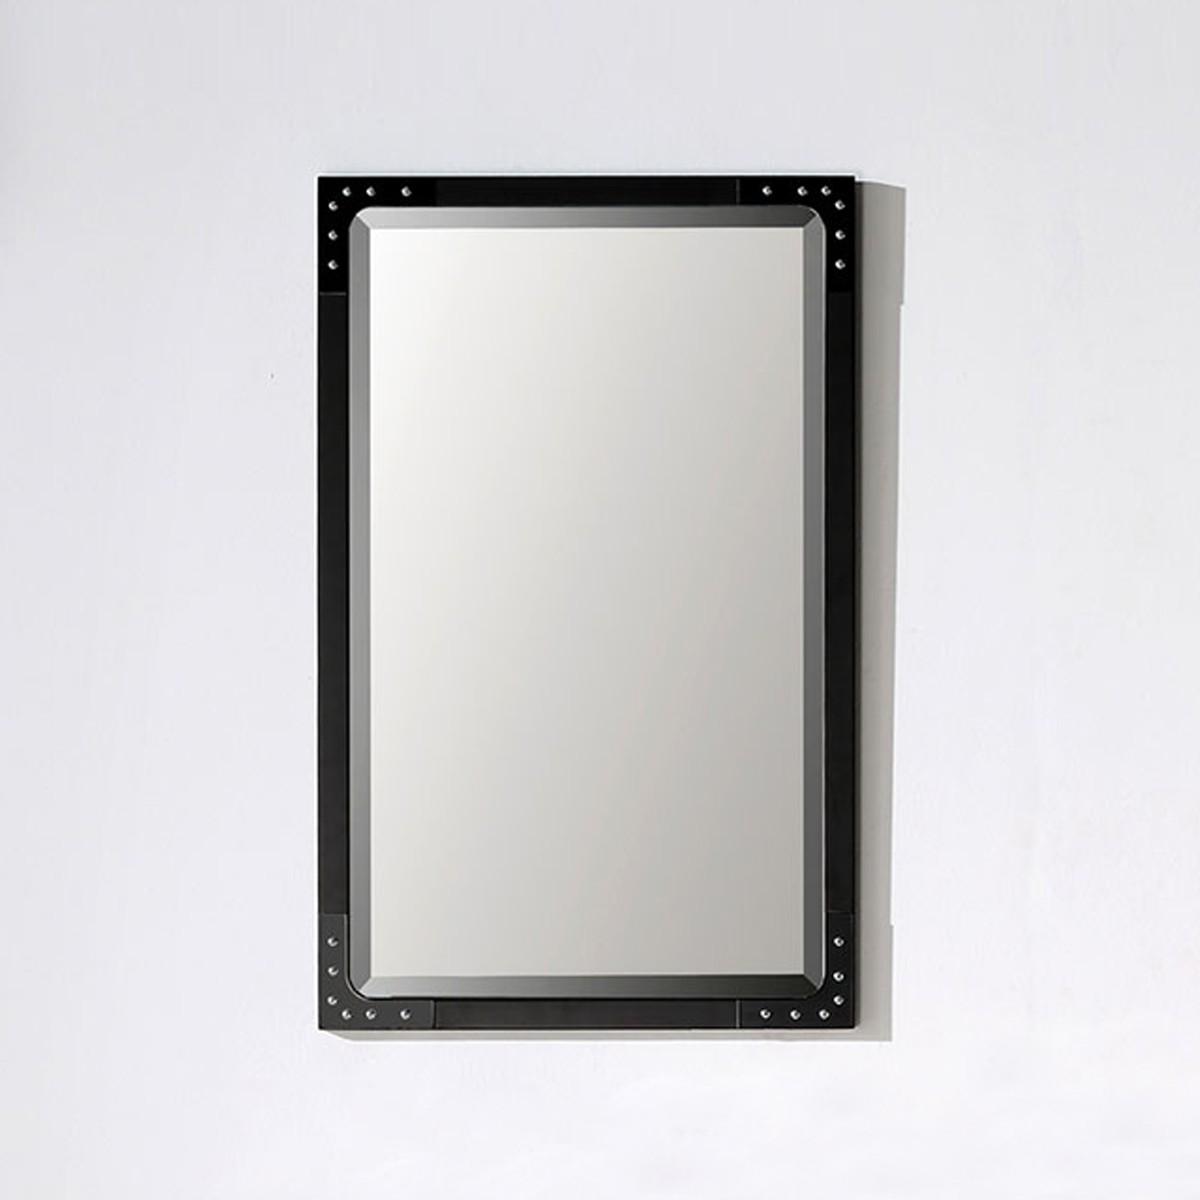 30 po Miroir pour Meuble Salle de Bain (DK-5730-BM)